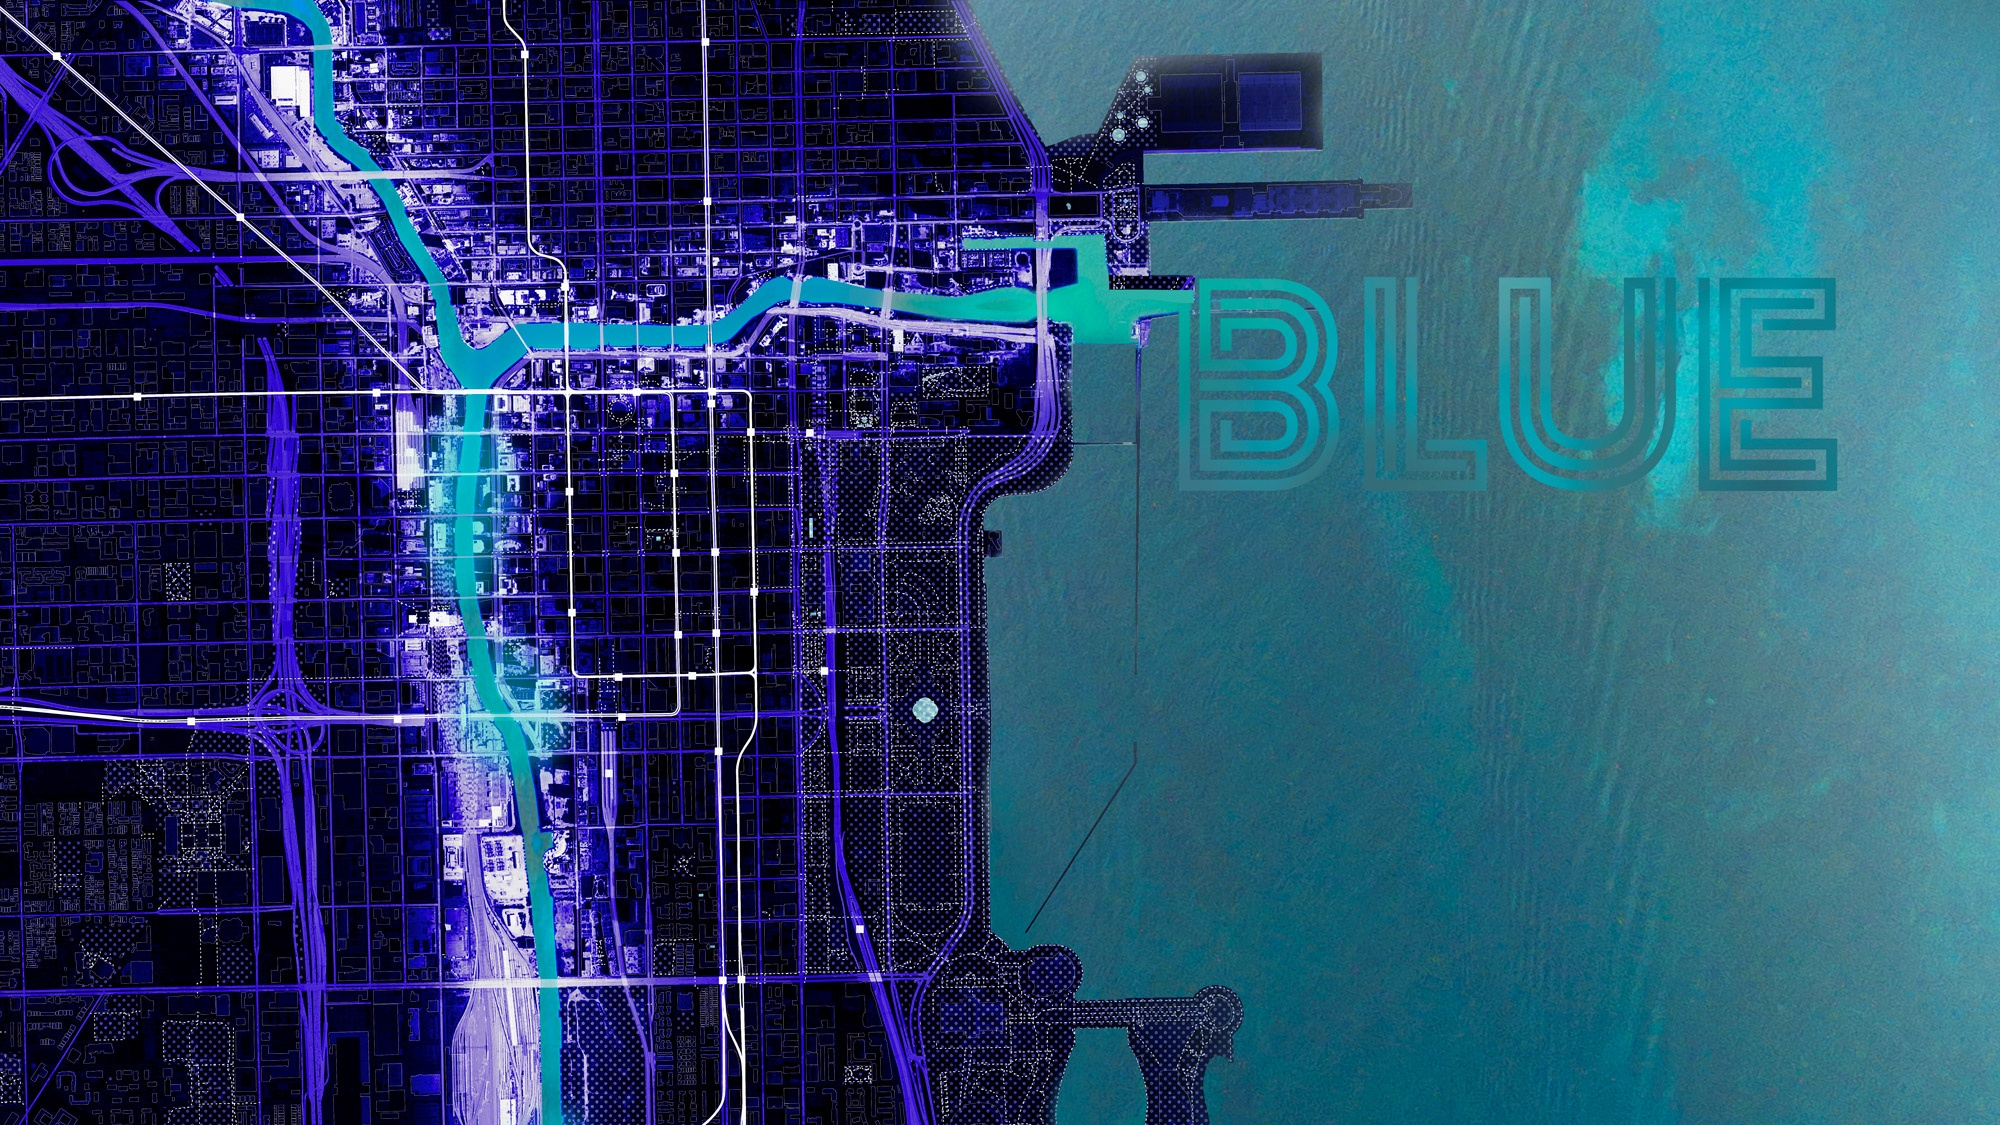 blue-by-swa.jpg